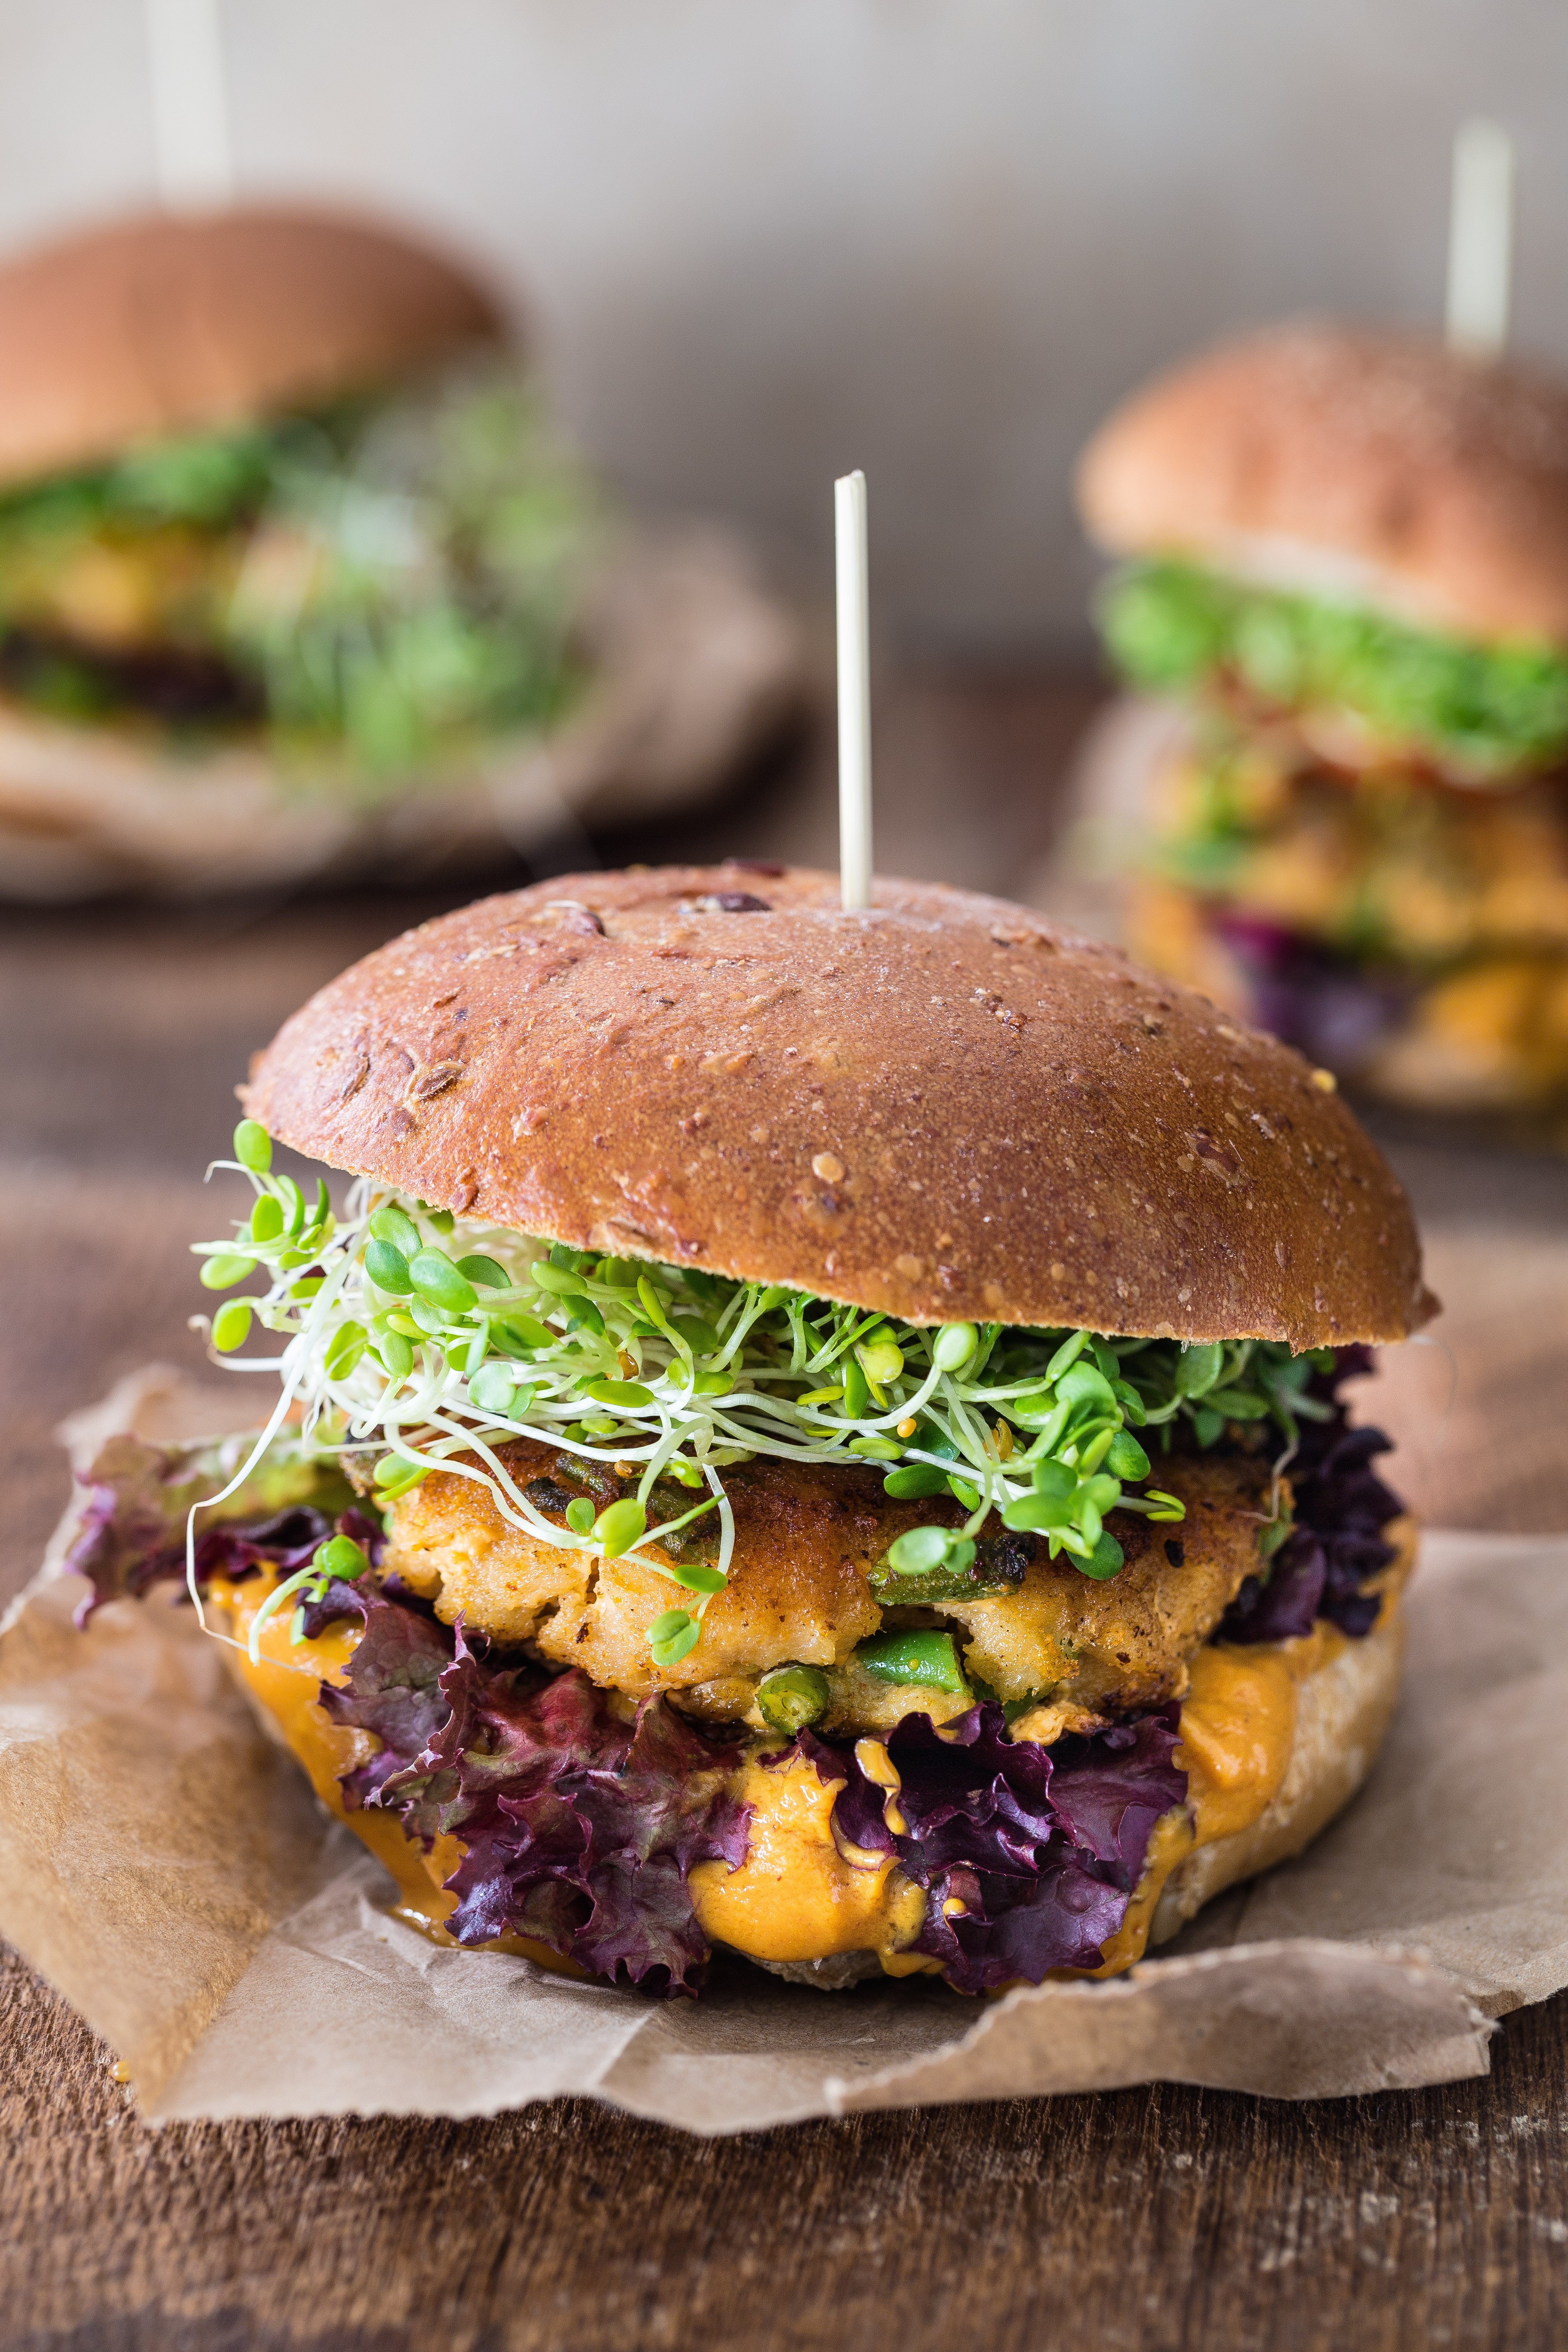 Thai fish burgers eat good 4 life for Fish burger recipe